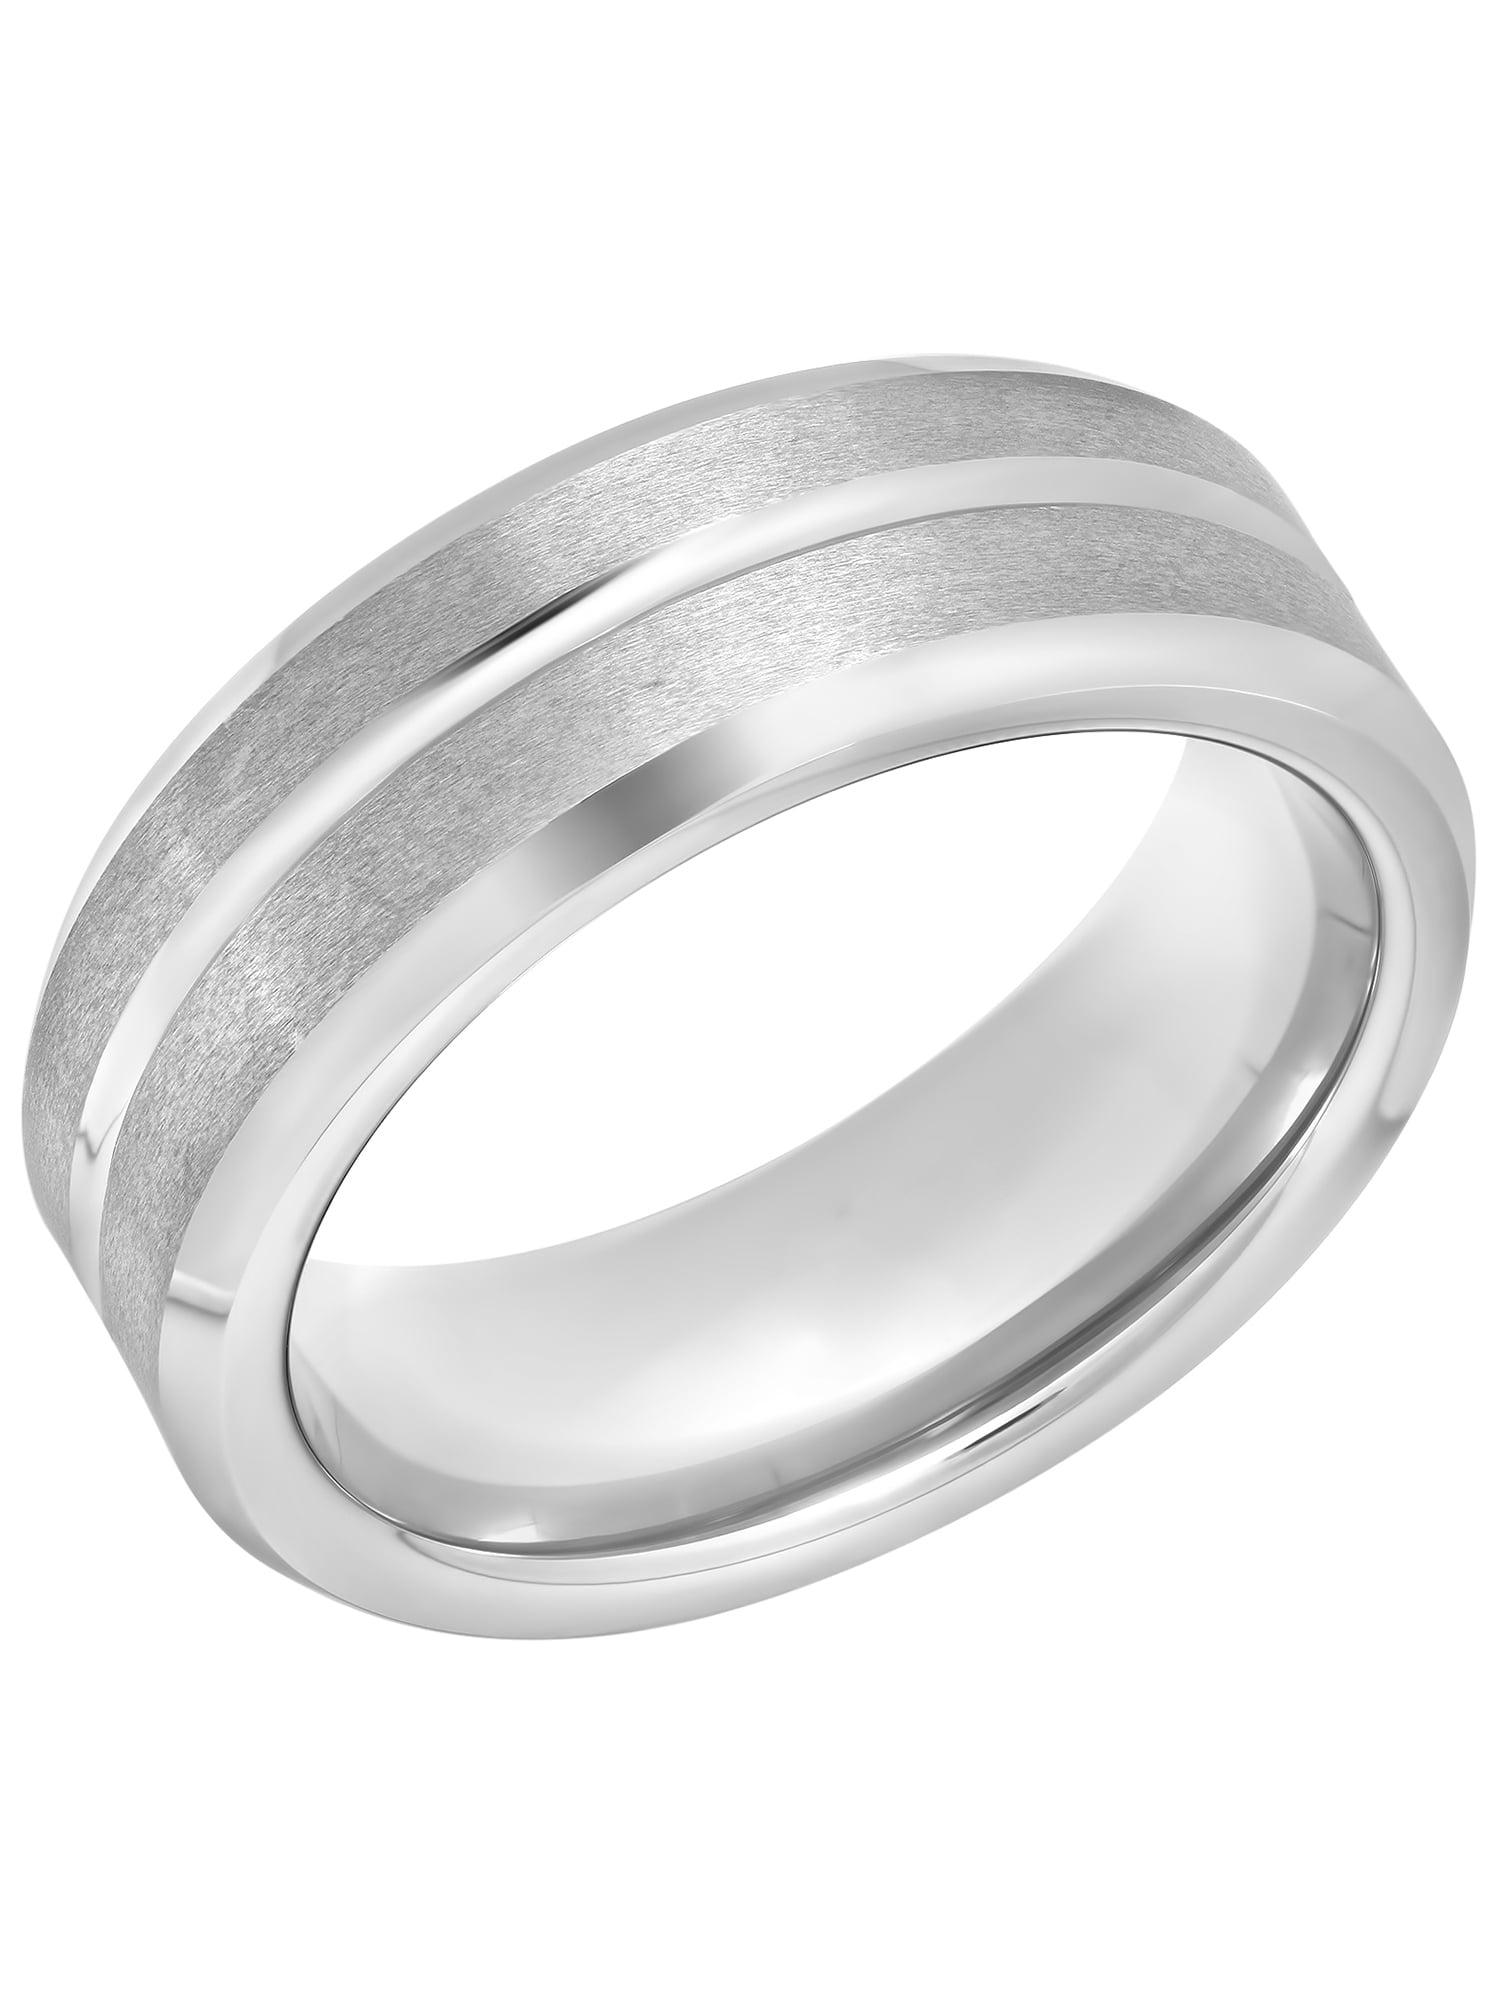 Men's White Tungsten 8MM Wedding Band - Mens Ring